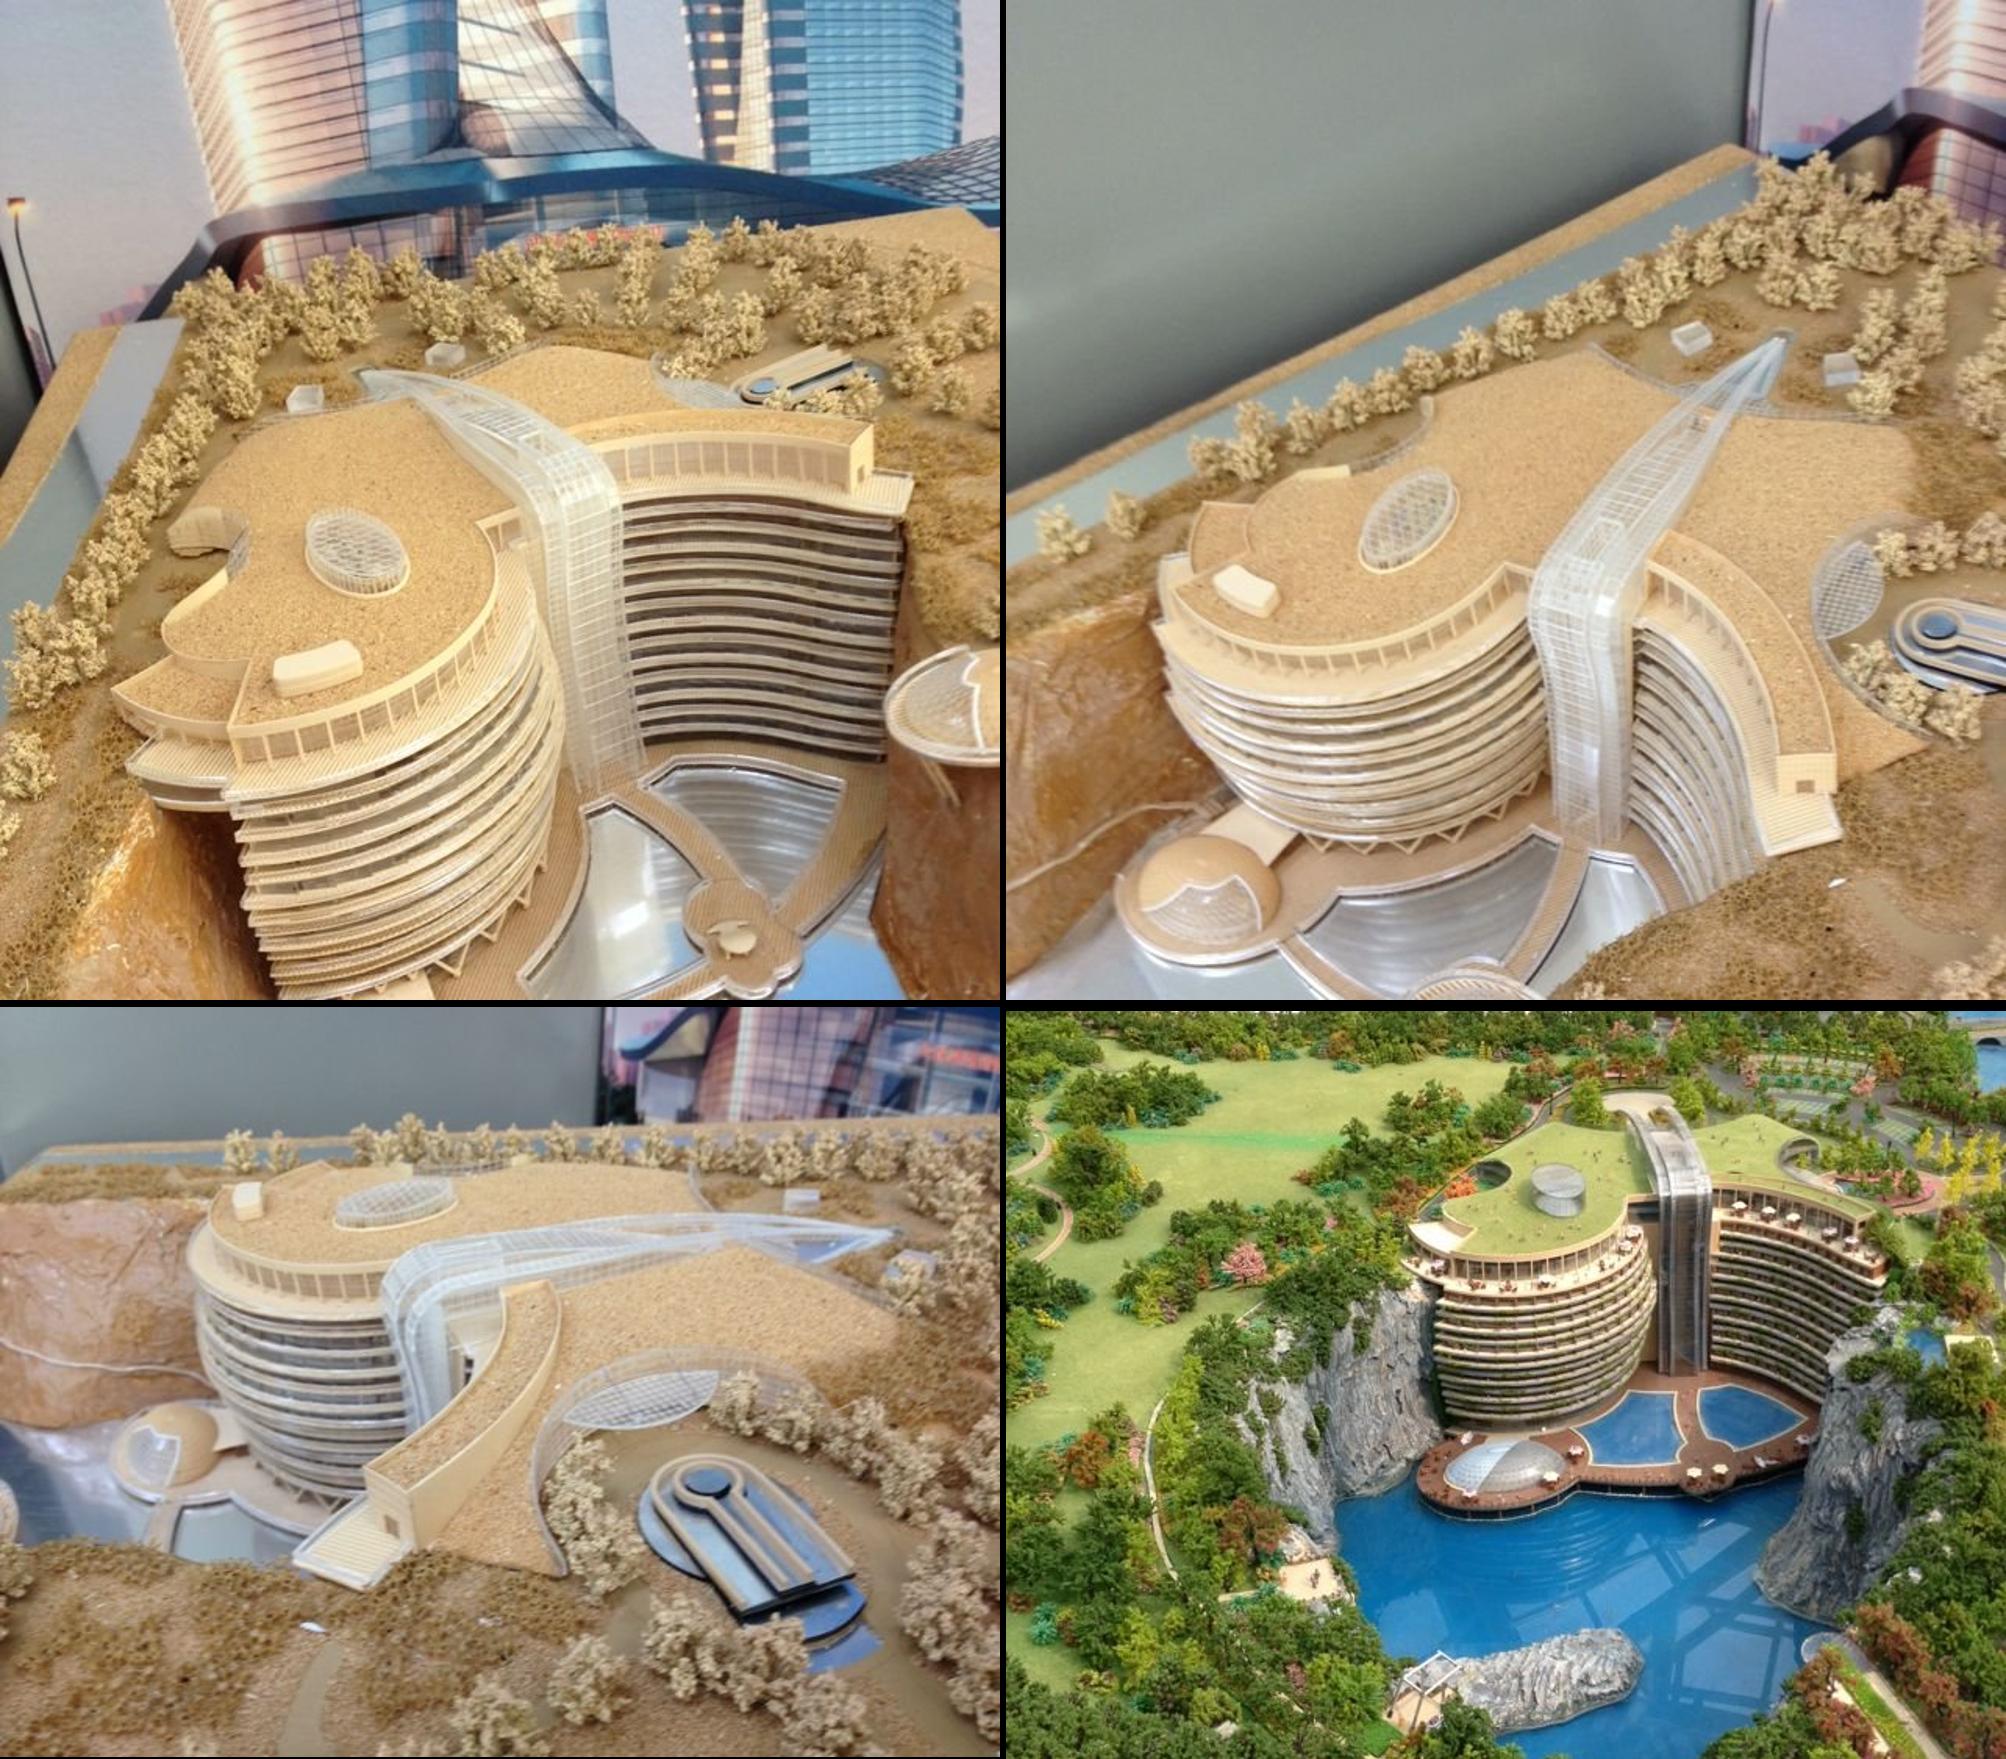 quarry hotel LS MODEL